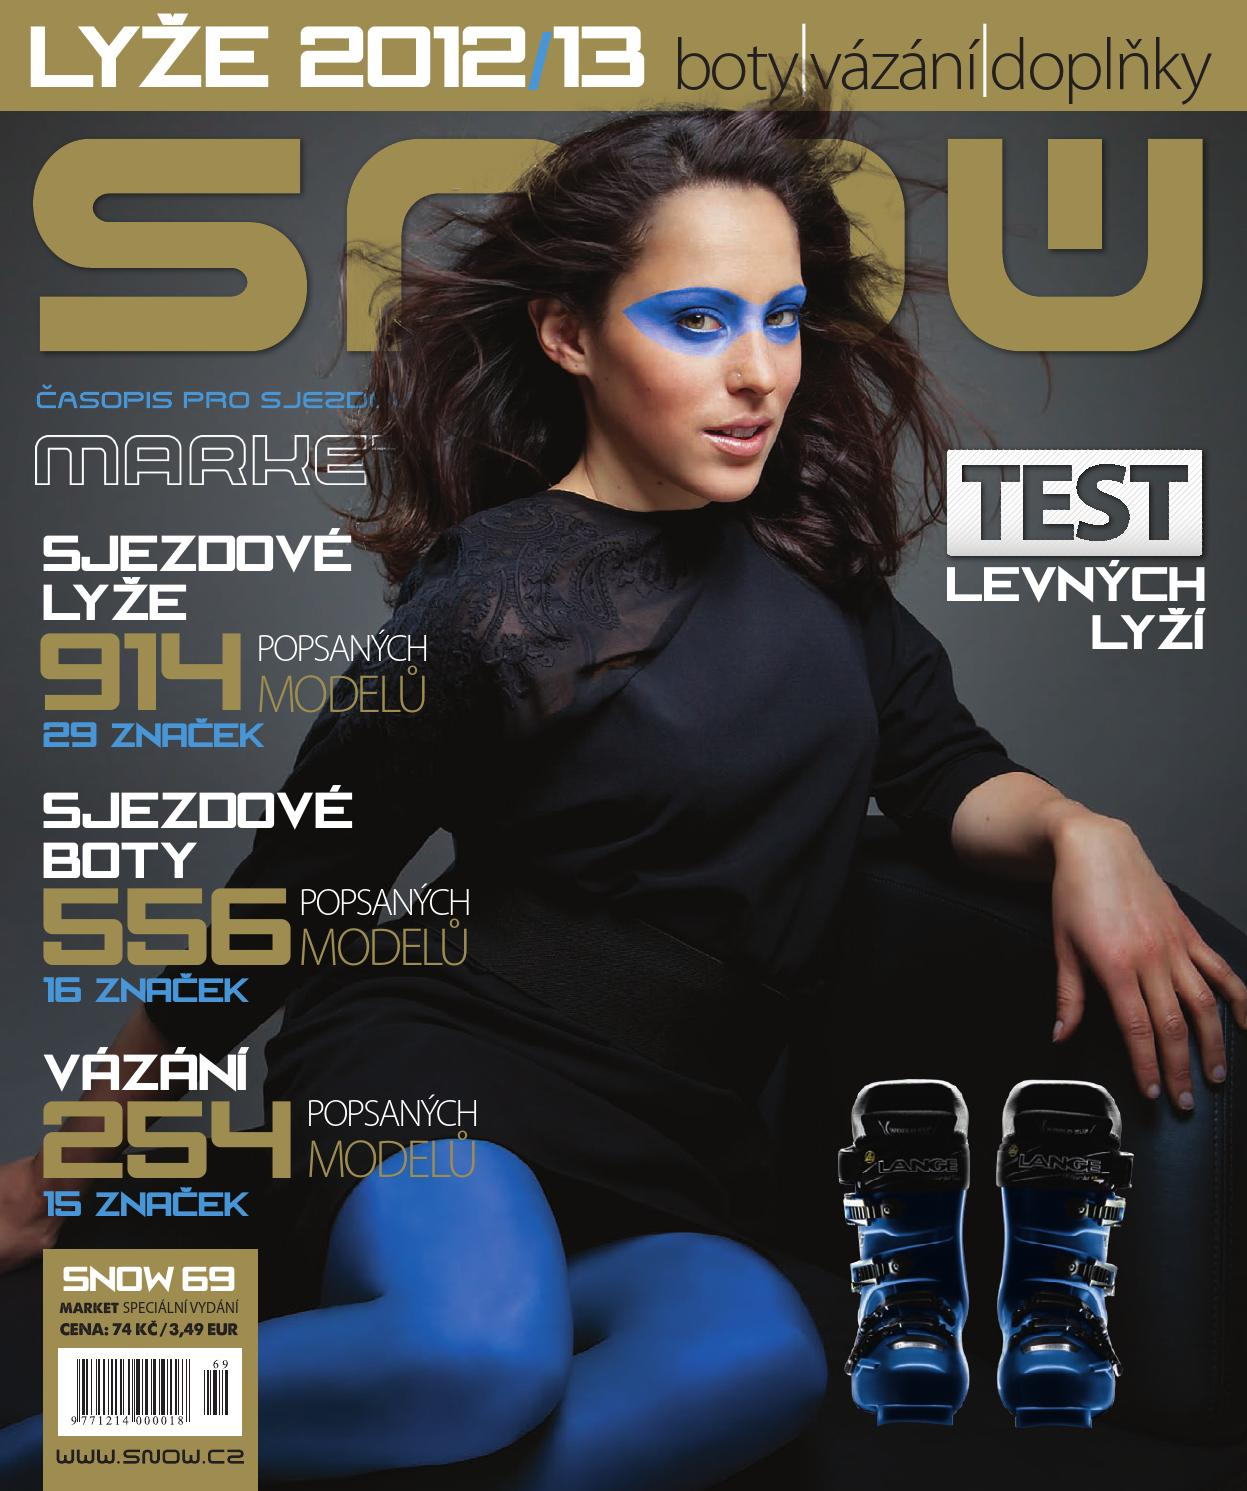 b350f090df8 SNOW 69 Market - Lyže 2012 13 by SNOW CZ s.r.o. - issuu